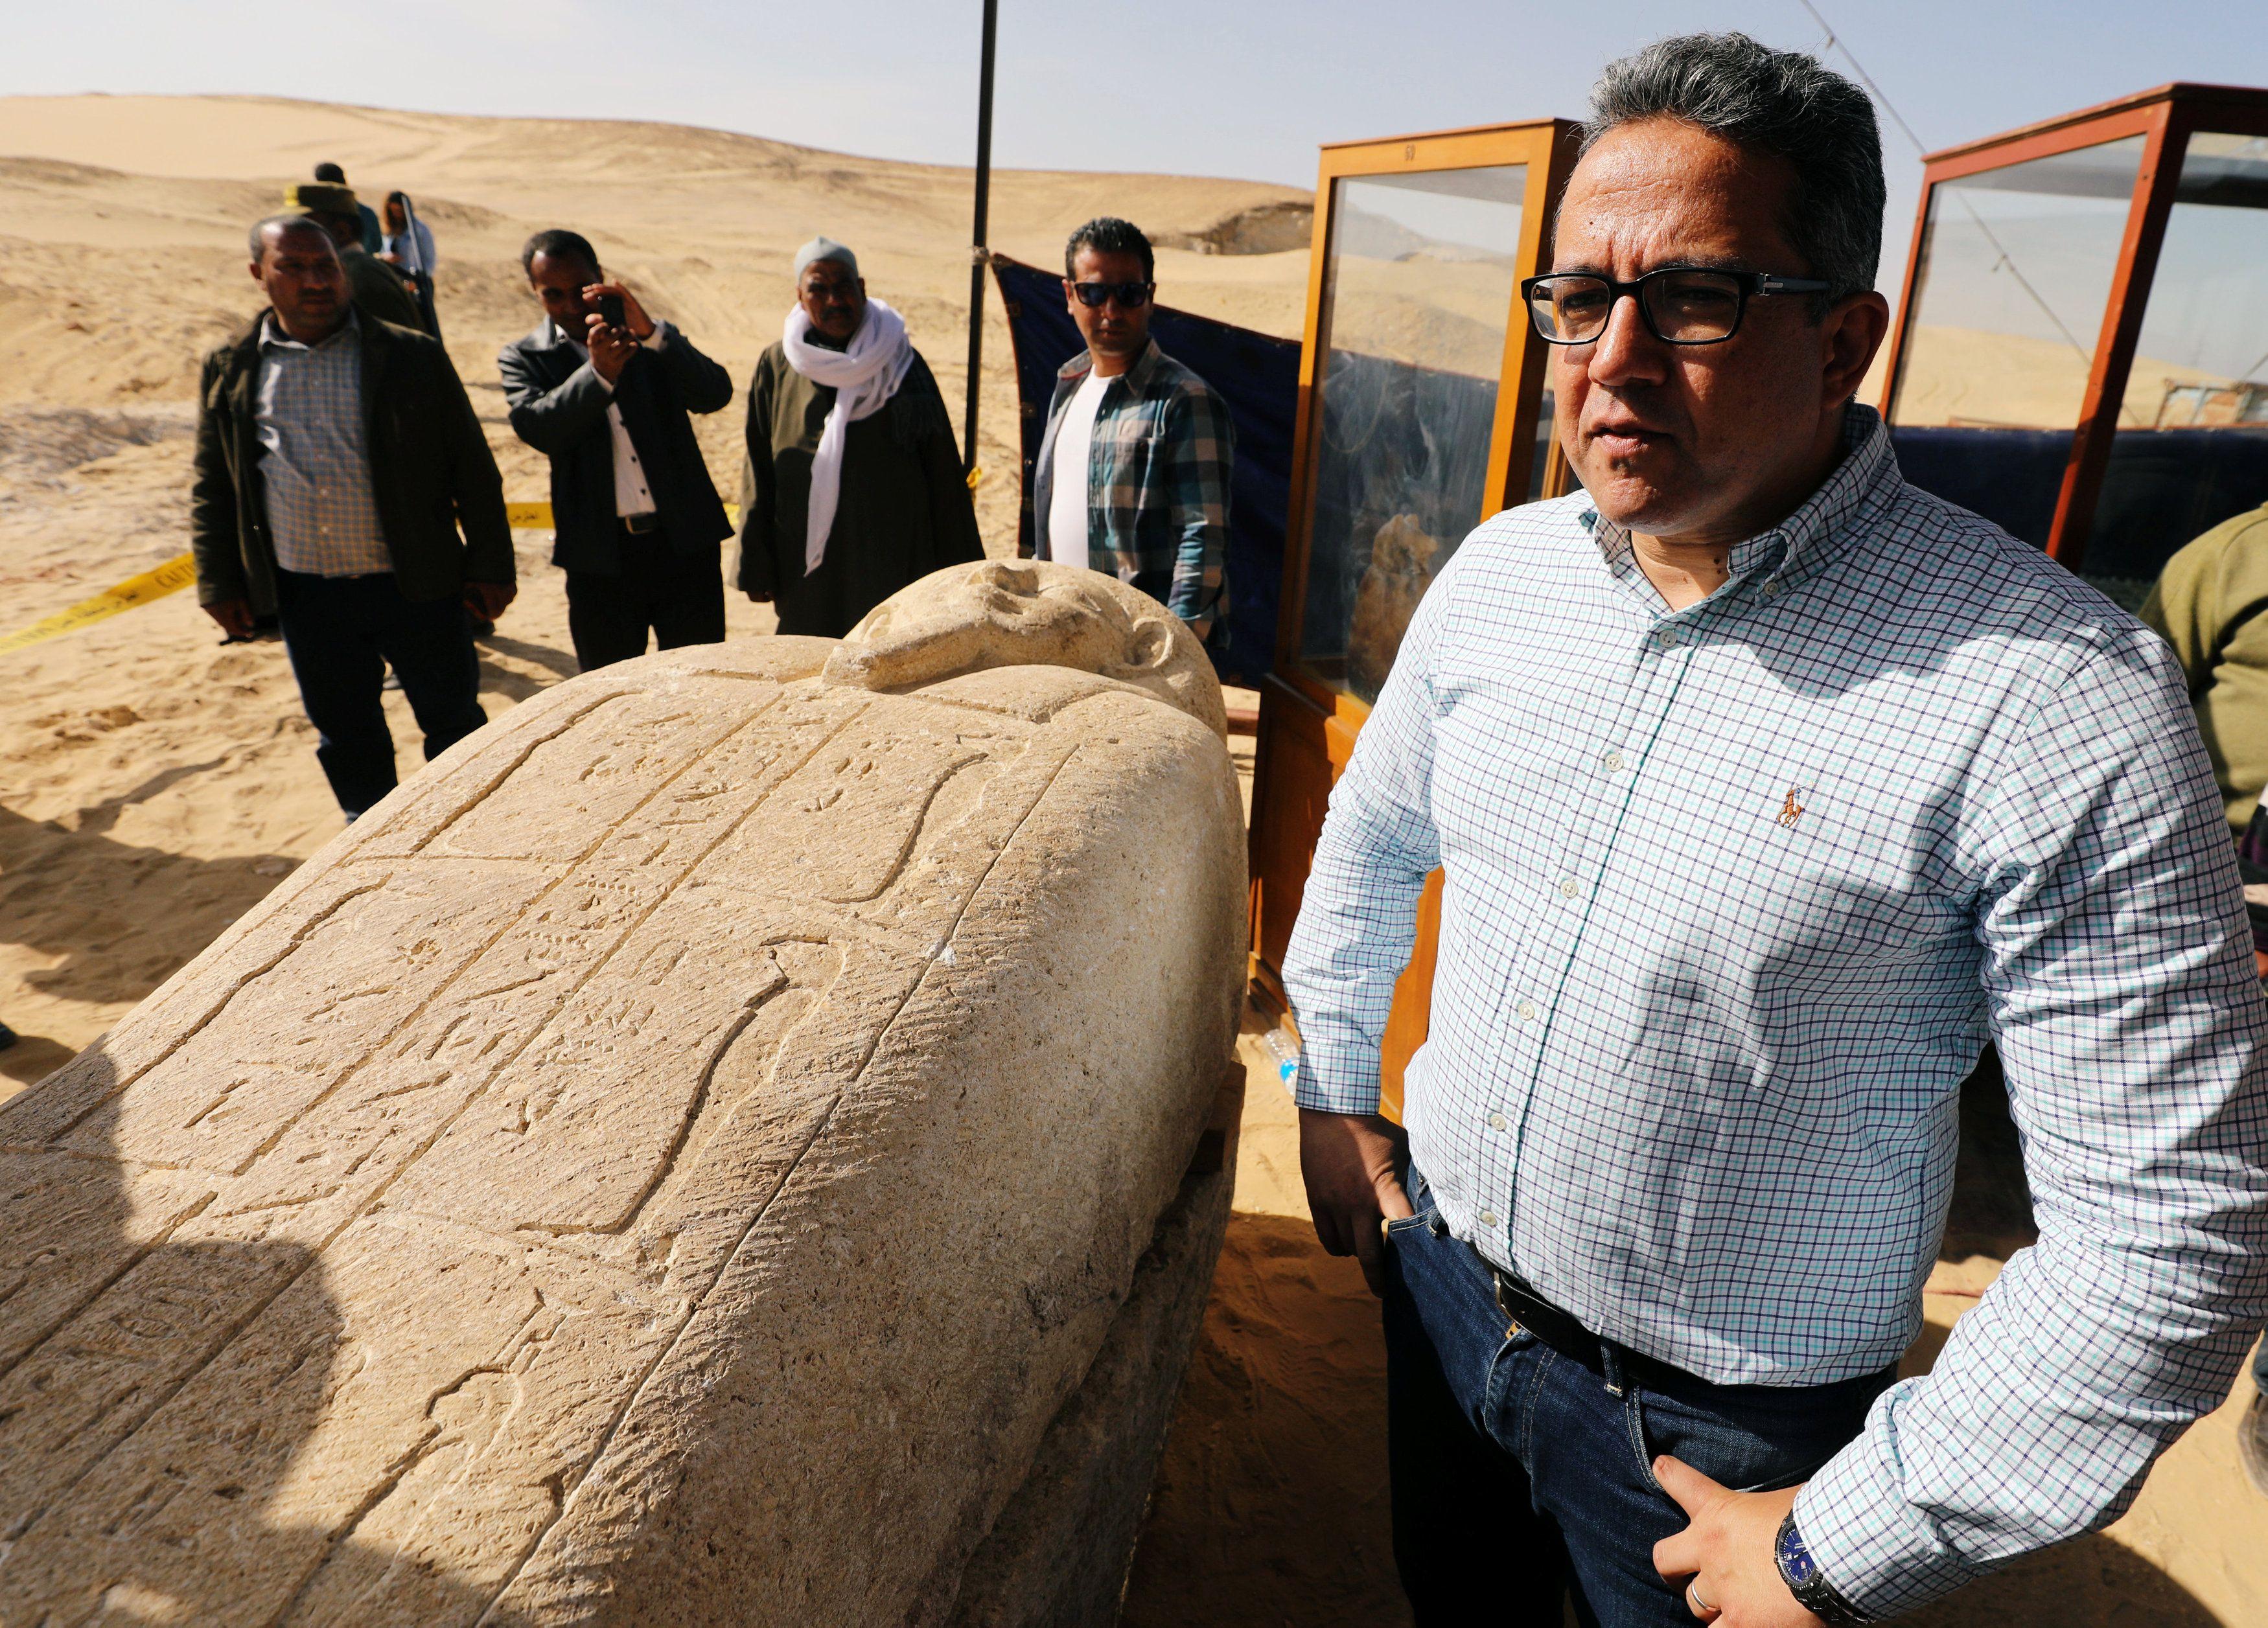 Ministro das Antiguidades fala das descobertas arqueológicas